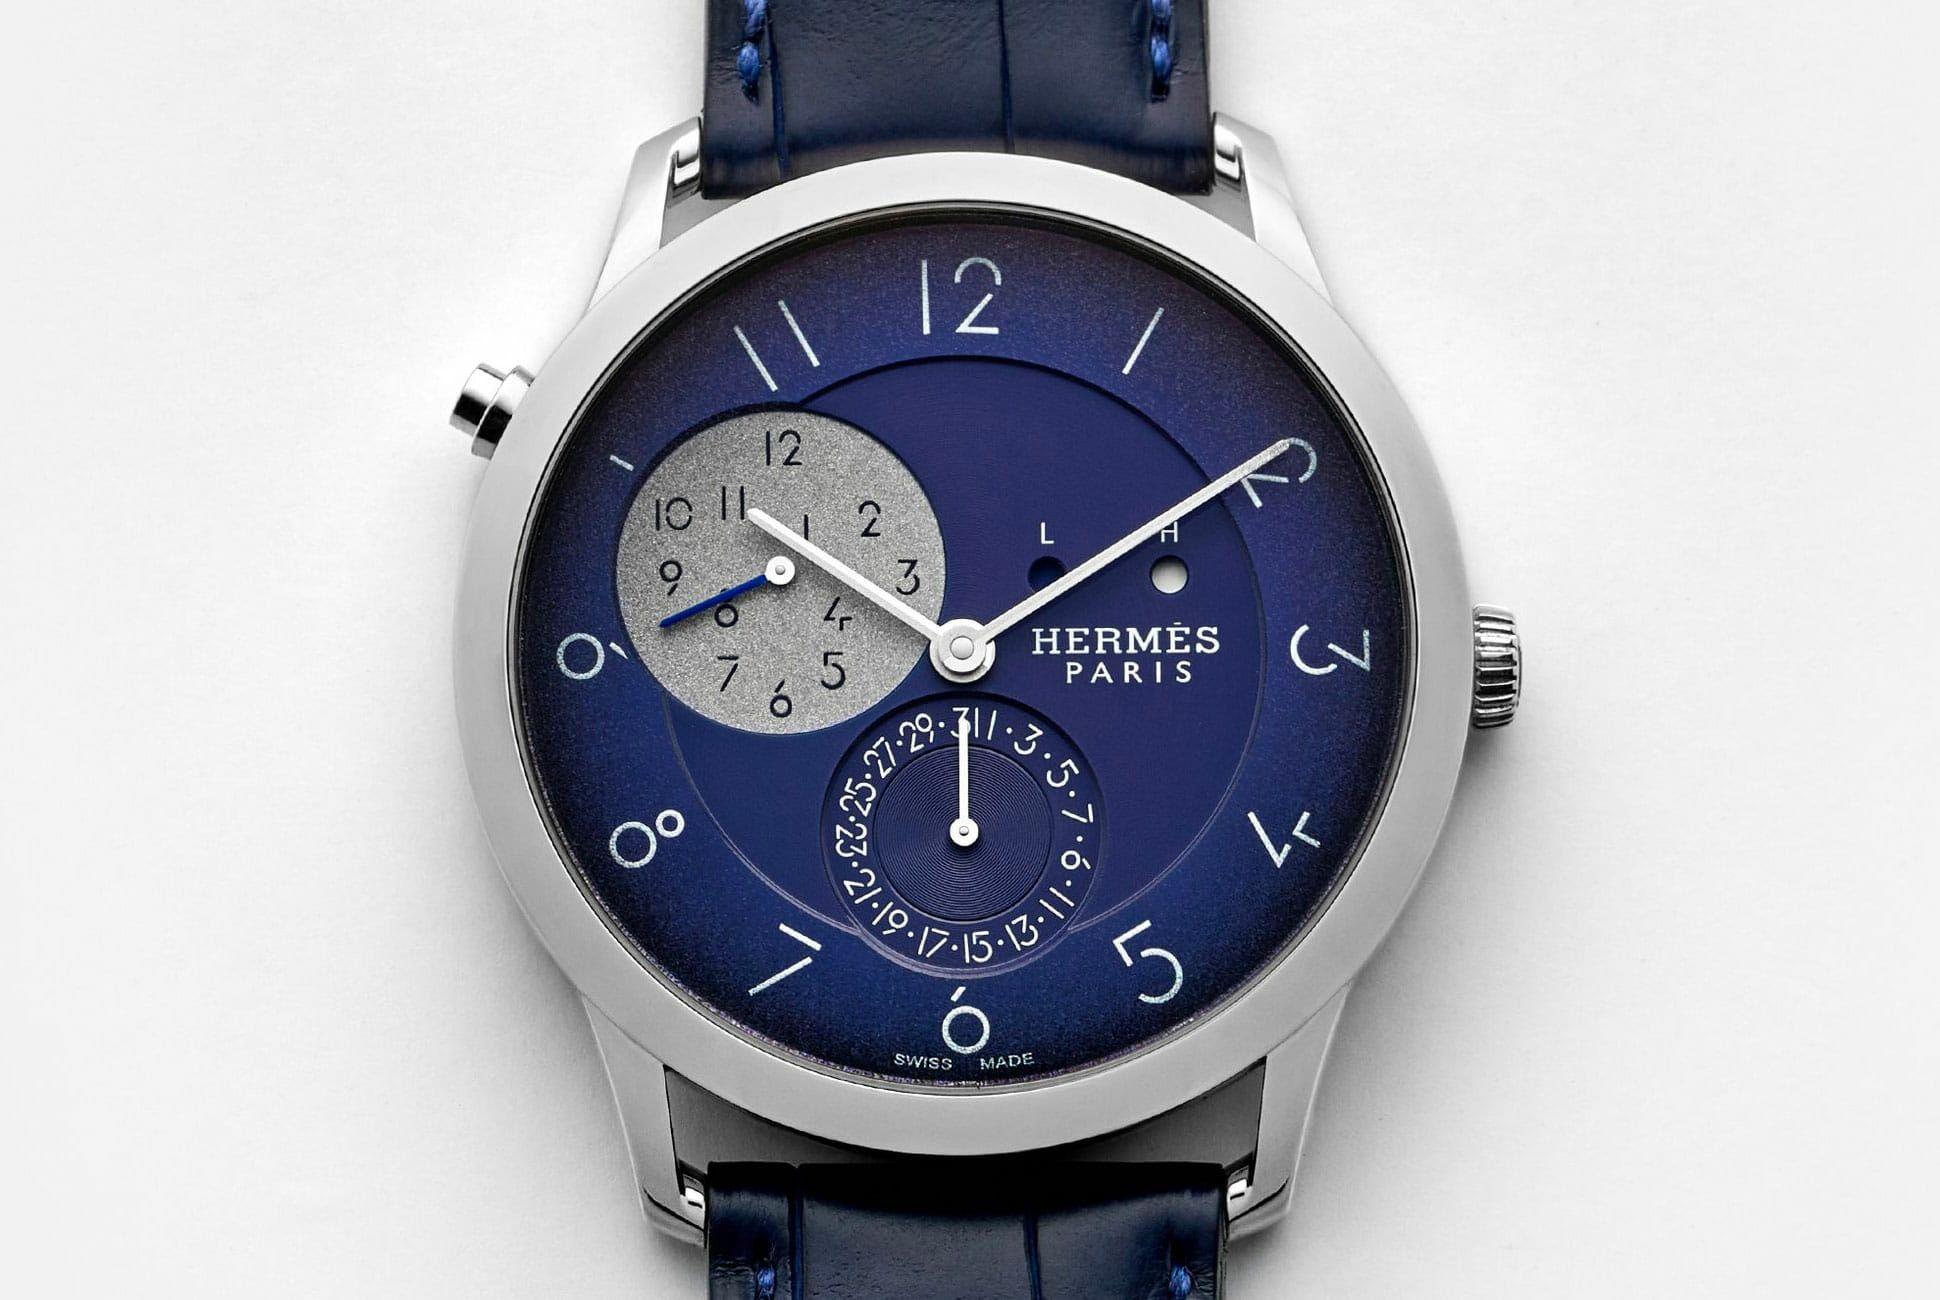 Hodinkee-X-Hermes-Watches-gear-patrol-slide-01